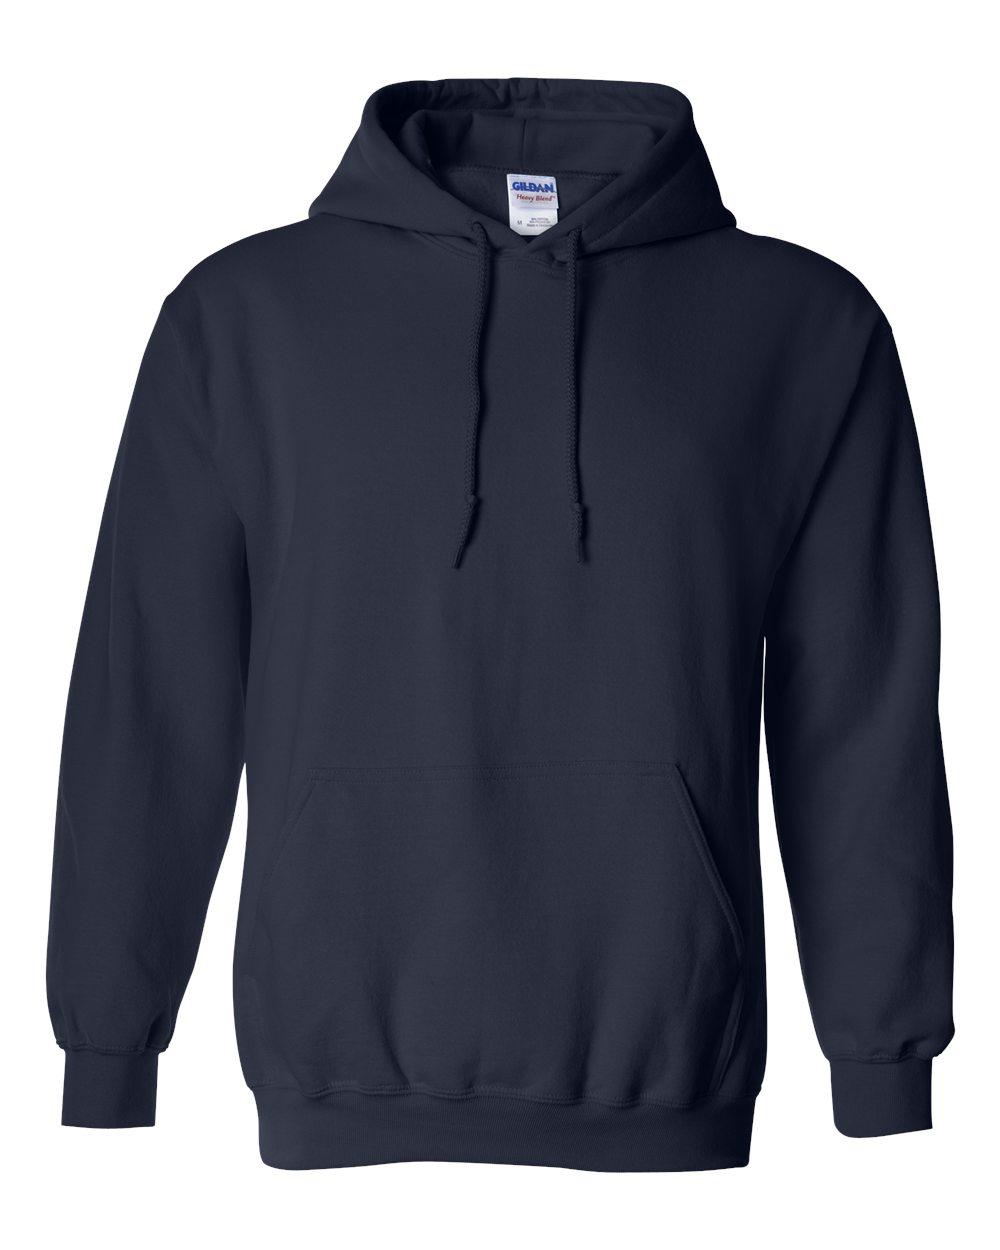 Gildan-Mens-Blank-Hoodie-Heavy-Blend-Hooded-Sweatshirt-Solid-18500-up-to-5XL thumbnail 65